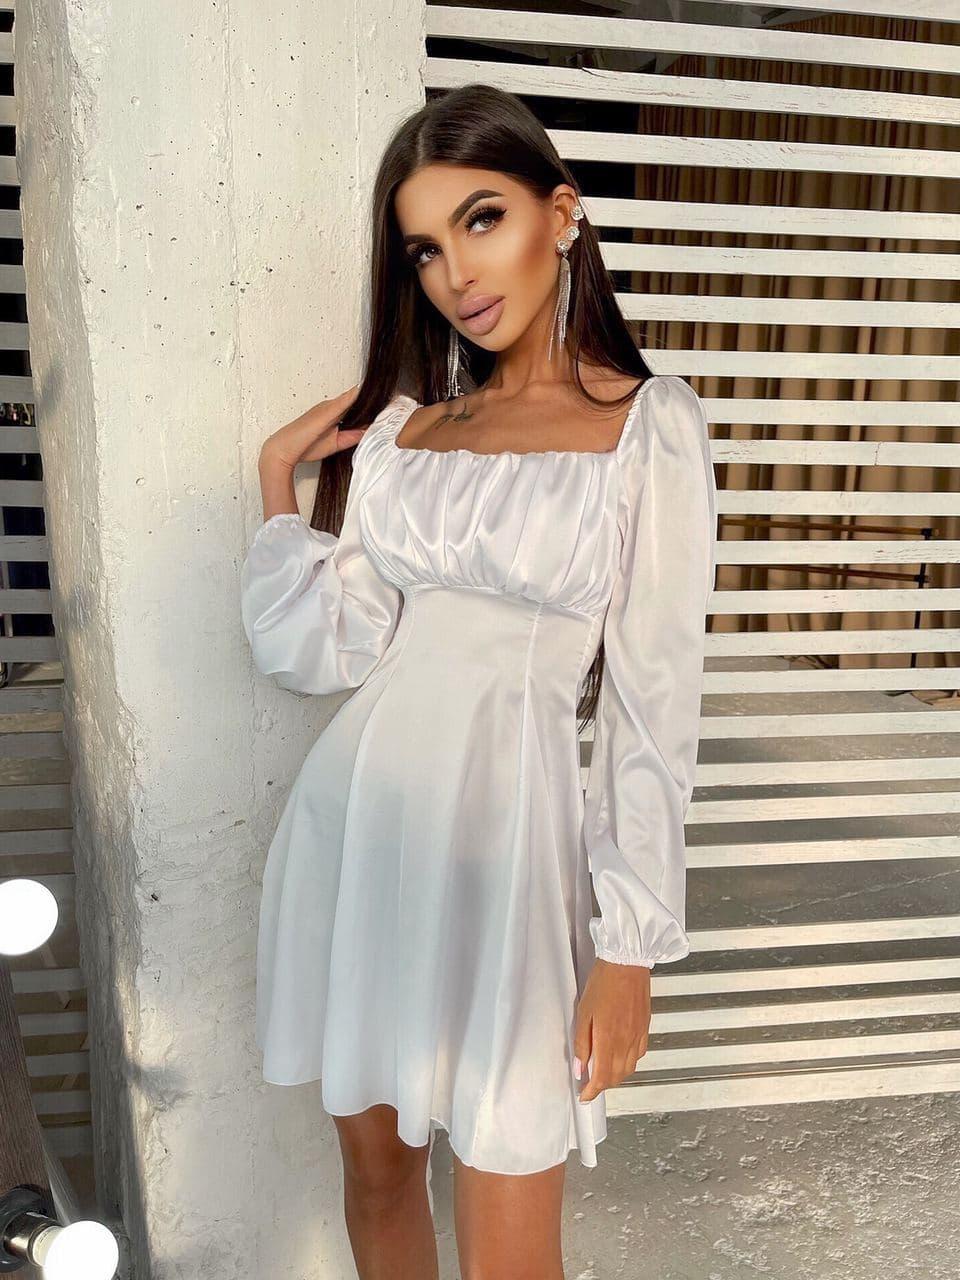 Шовкове приталену сукню зі складанням на грудях White